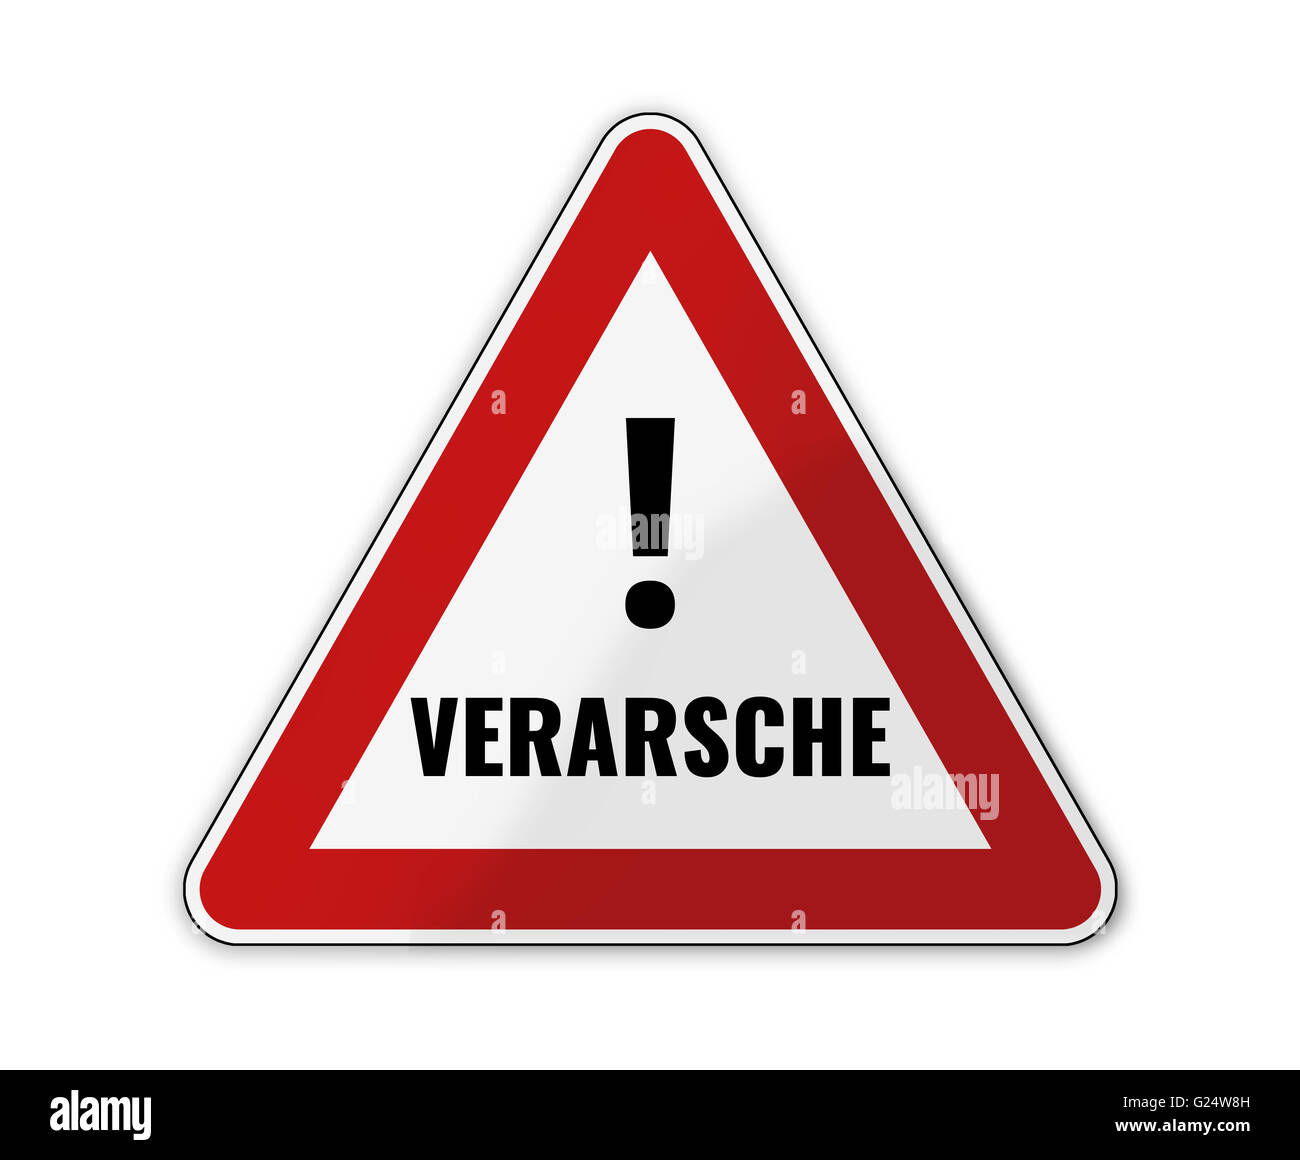 Verarsche - Stock Image